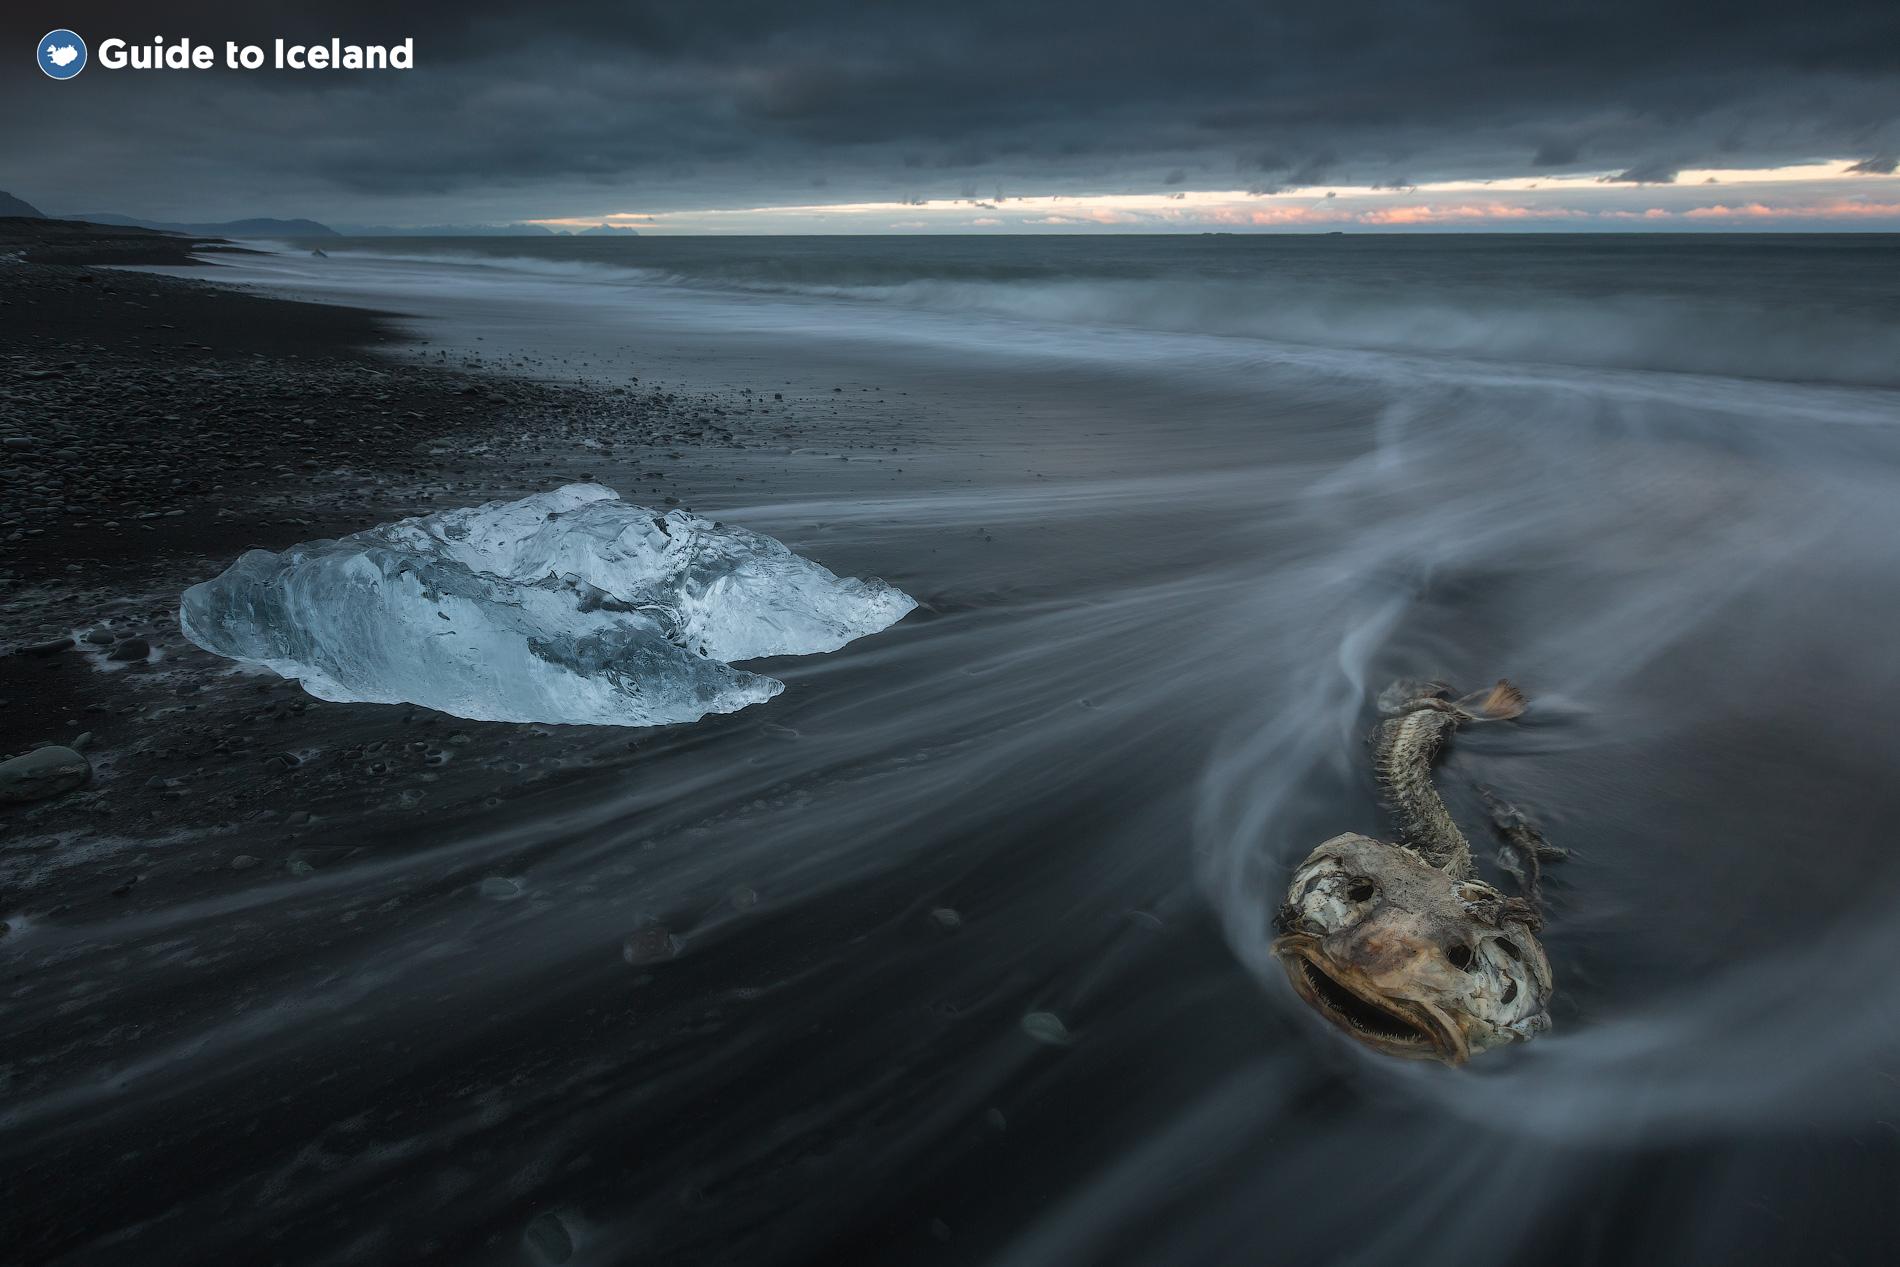 Pieces of ice resting on the Diamond Beach near Jökulsárlón Glacier Lagoon in the Southeast of Iceland.